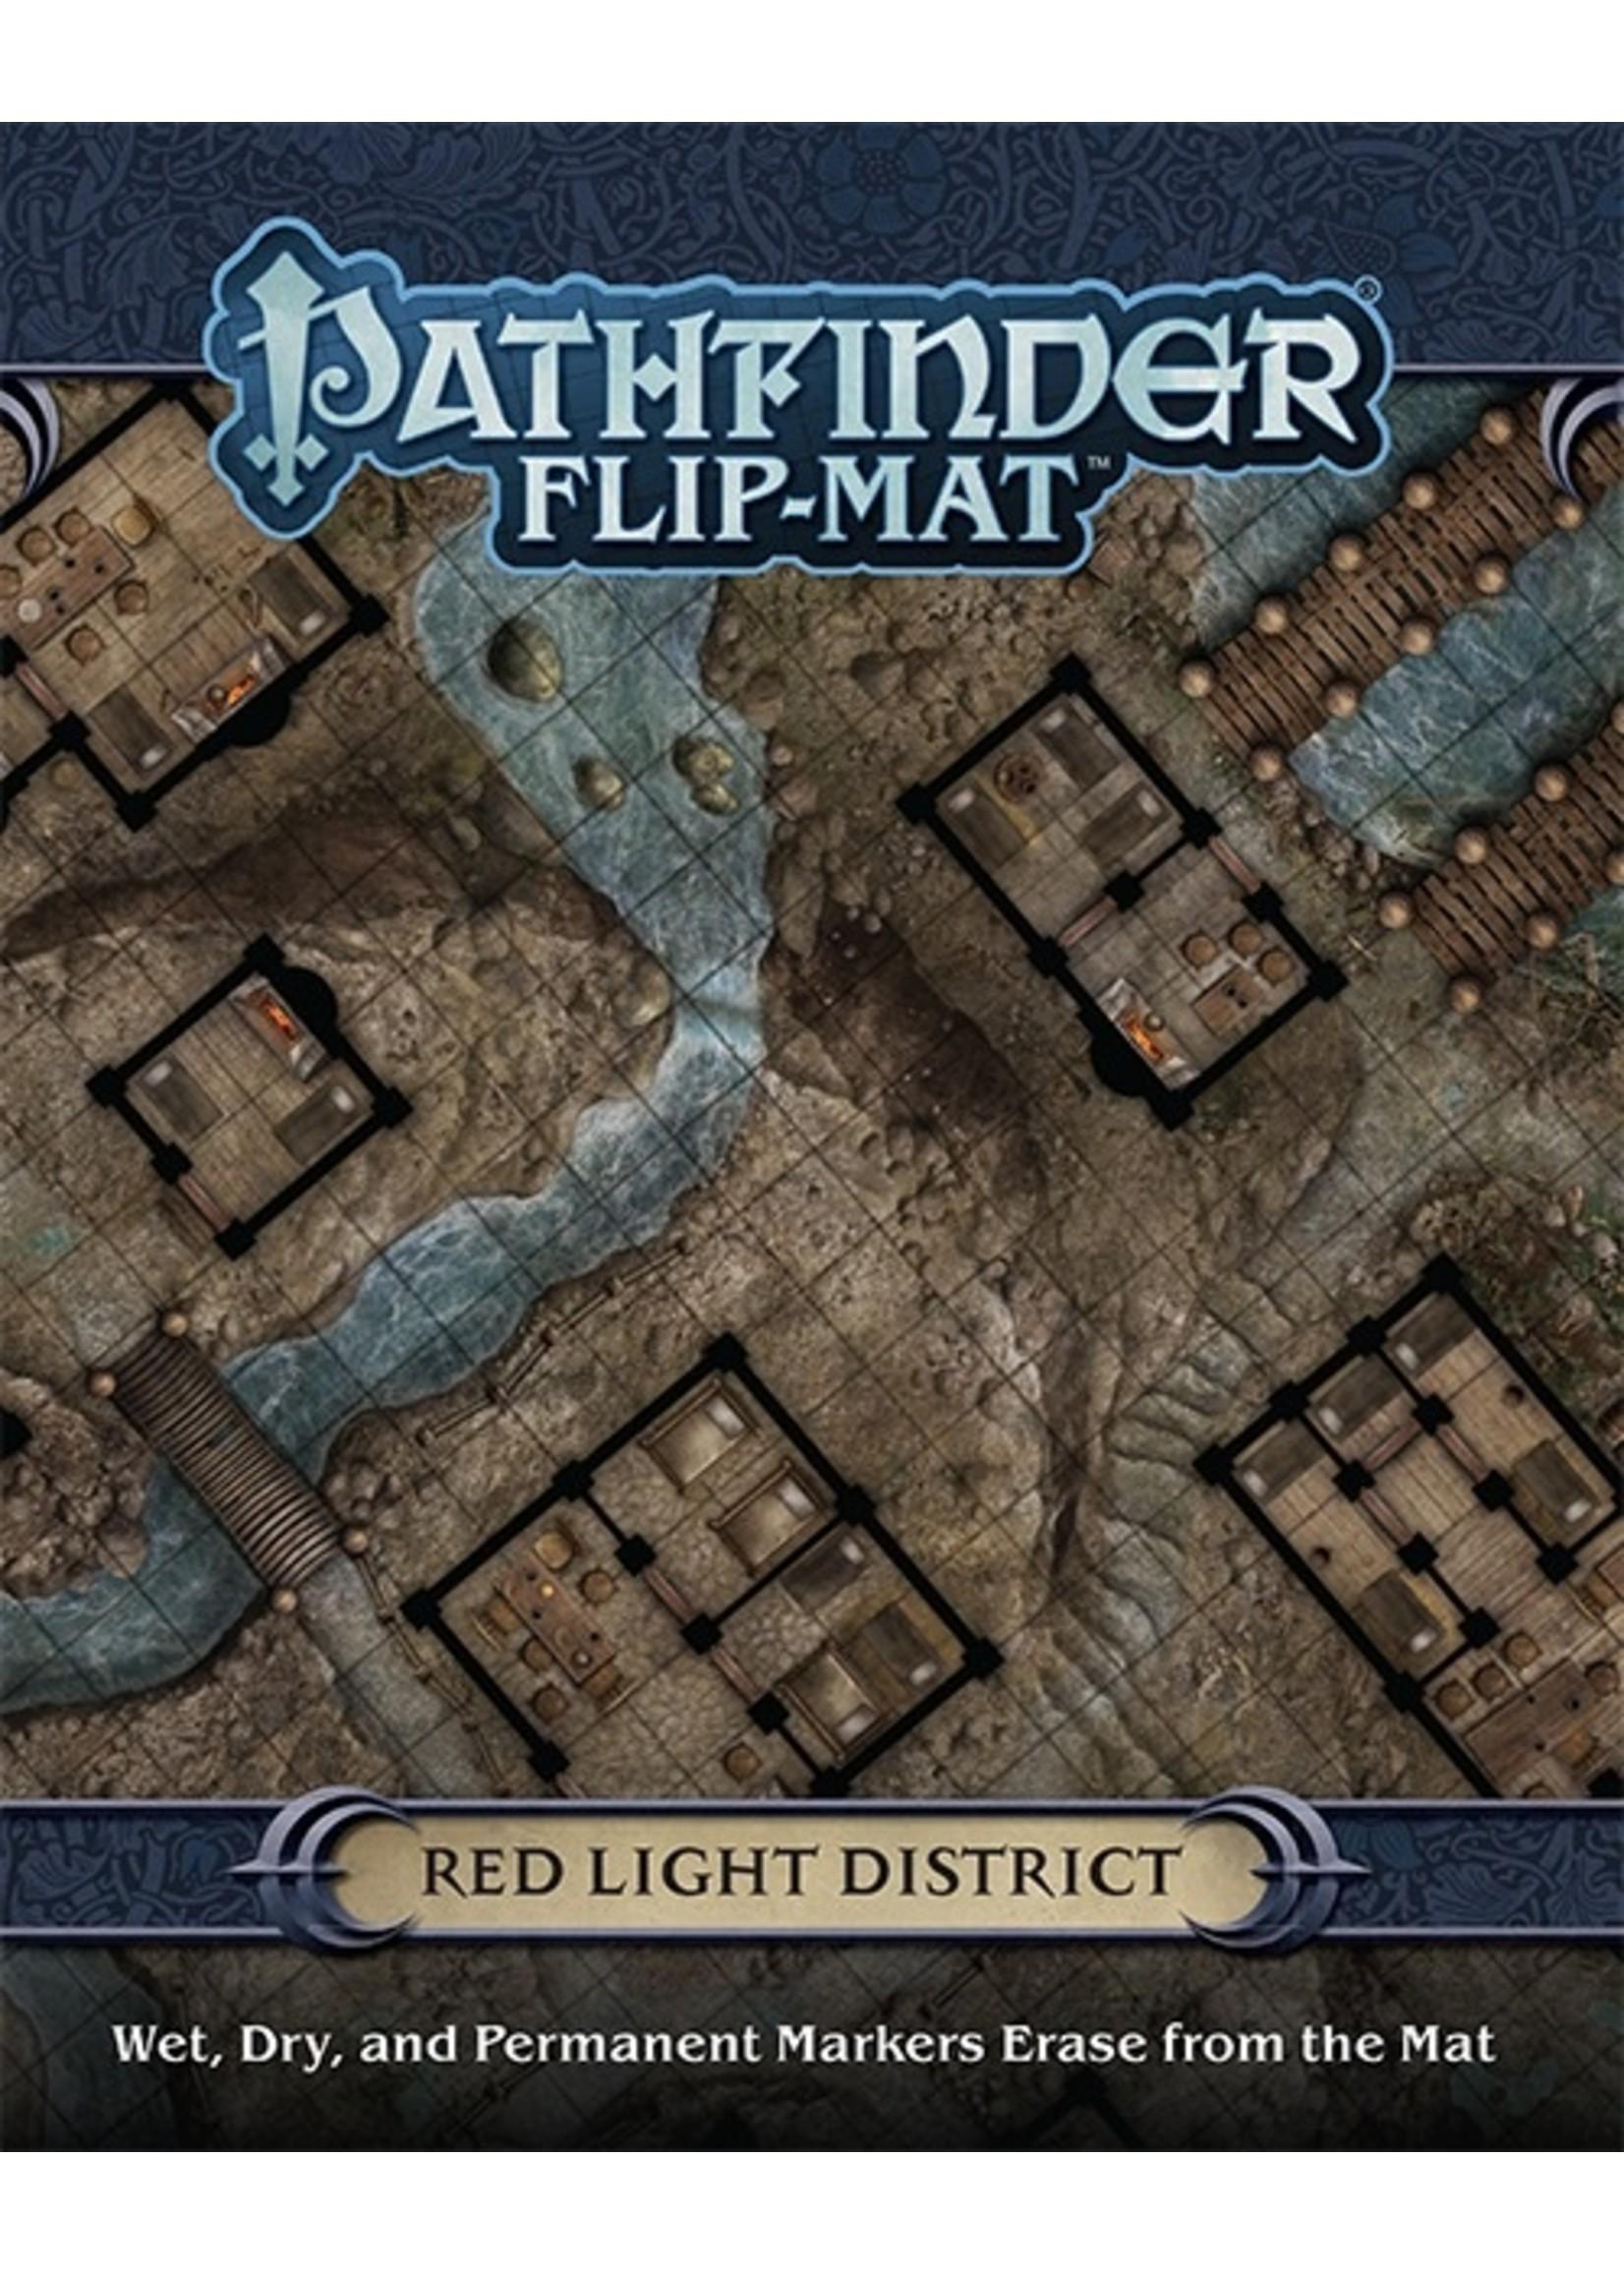 Pathfinder RPG: Flip-Mat - Red Light District